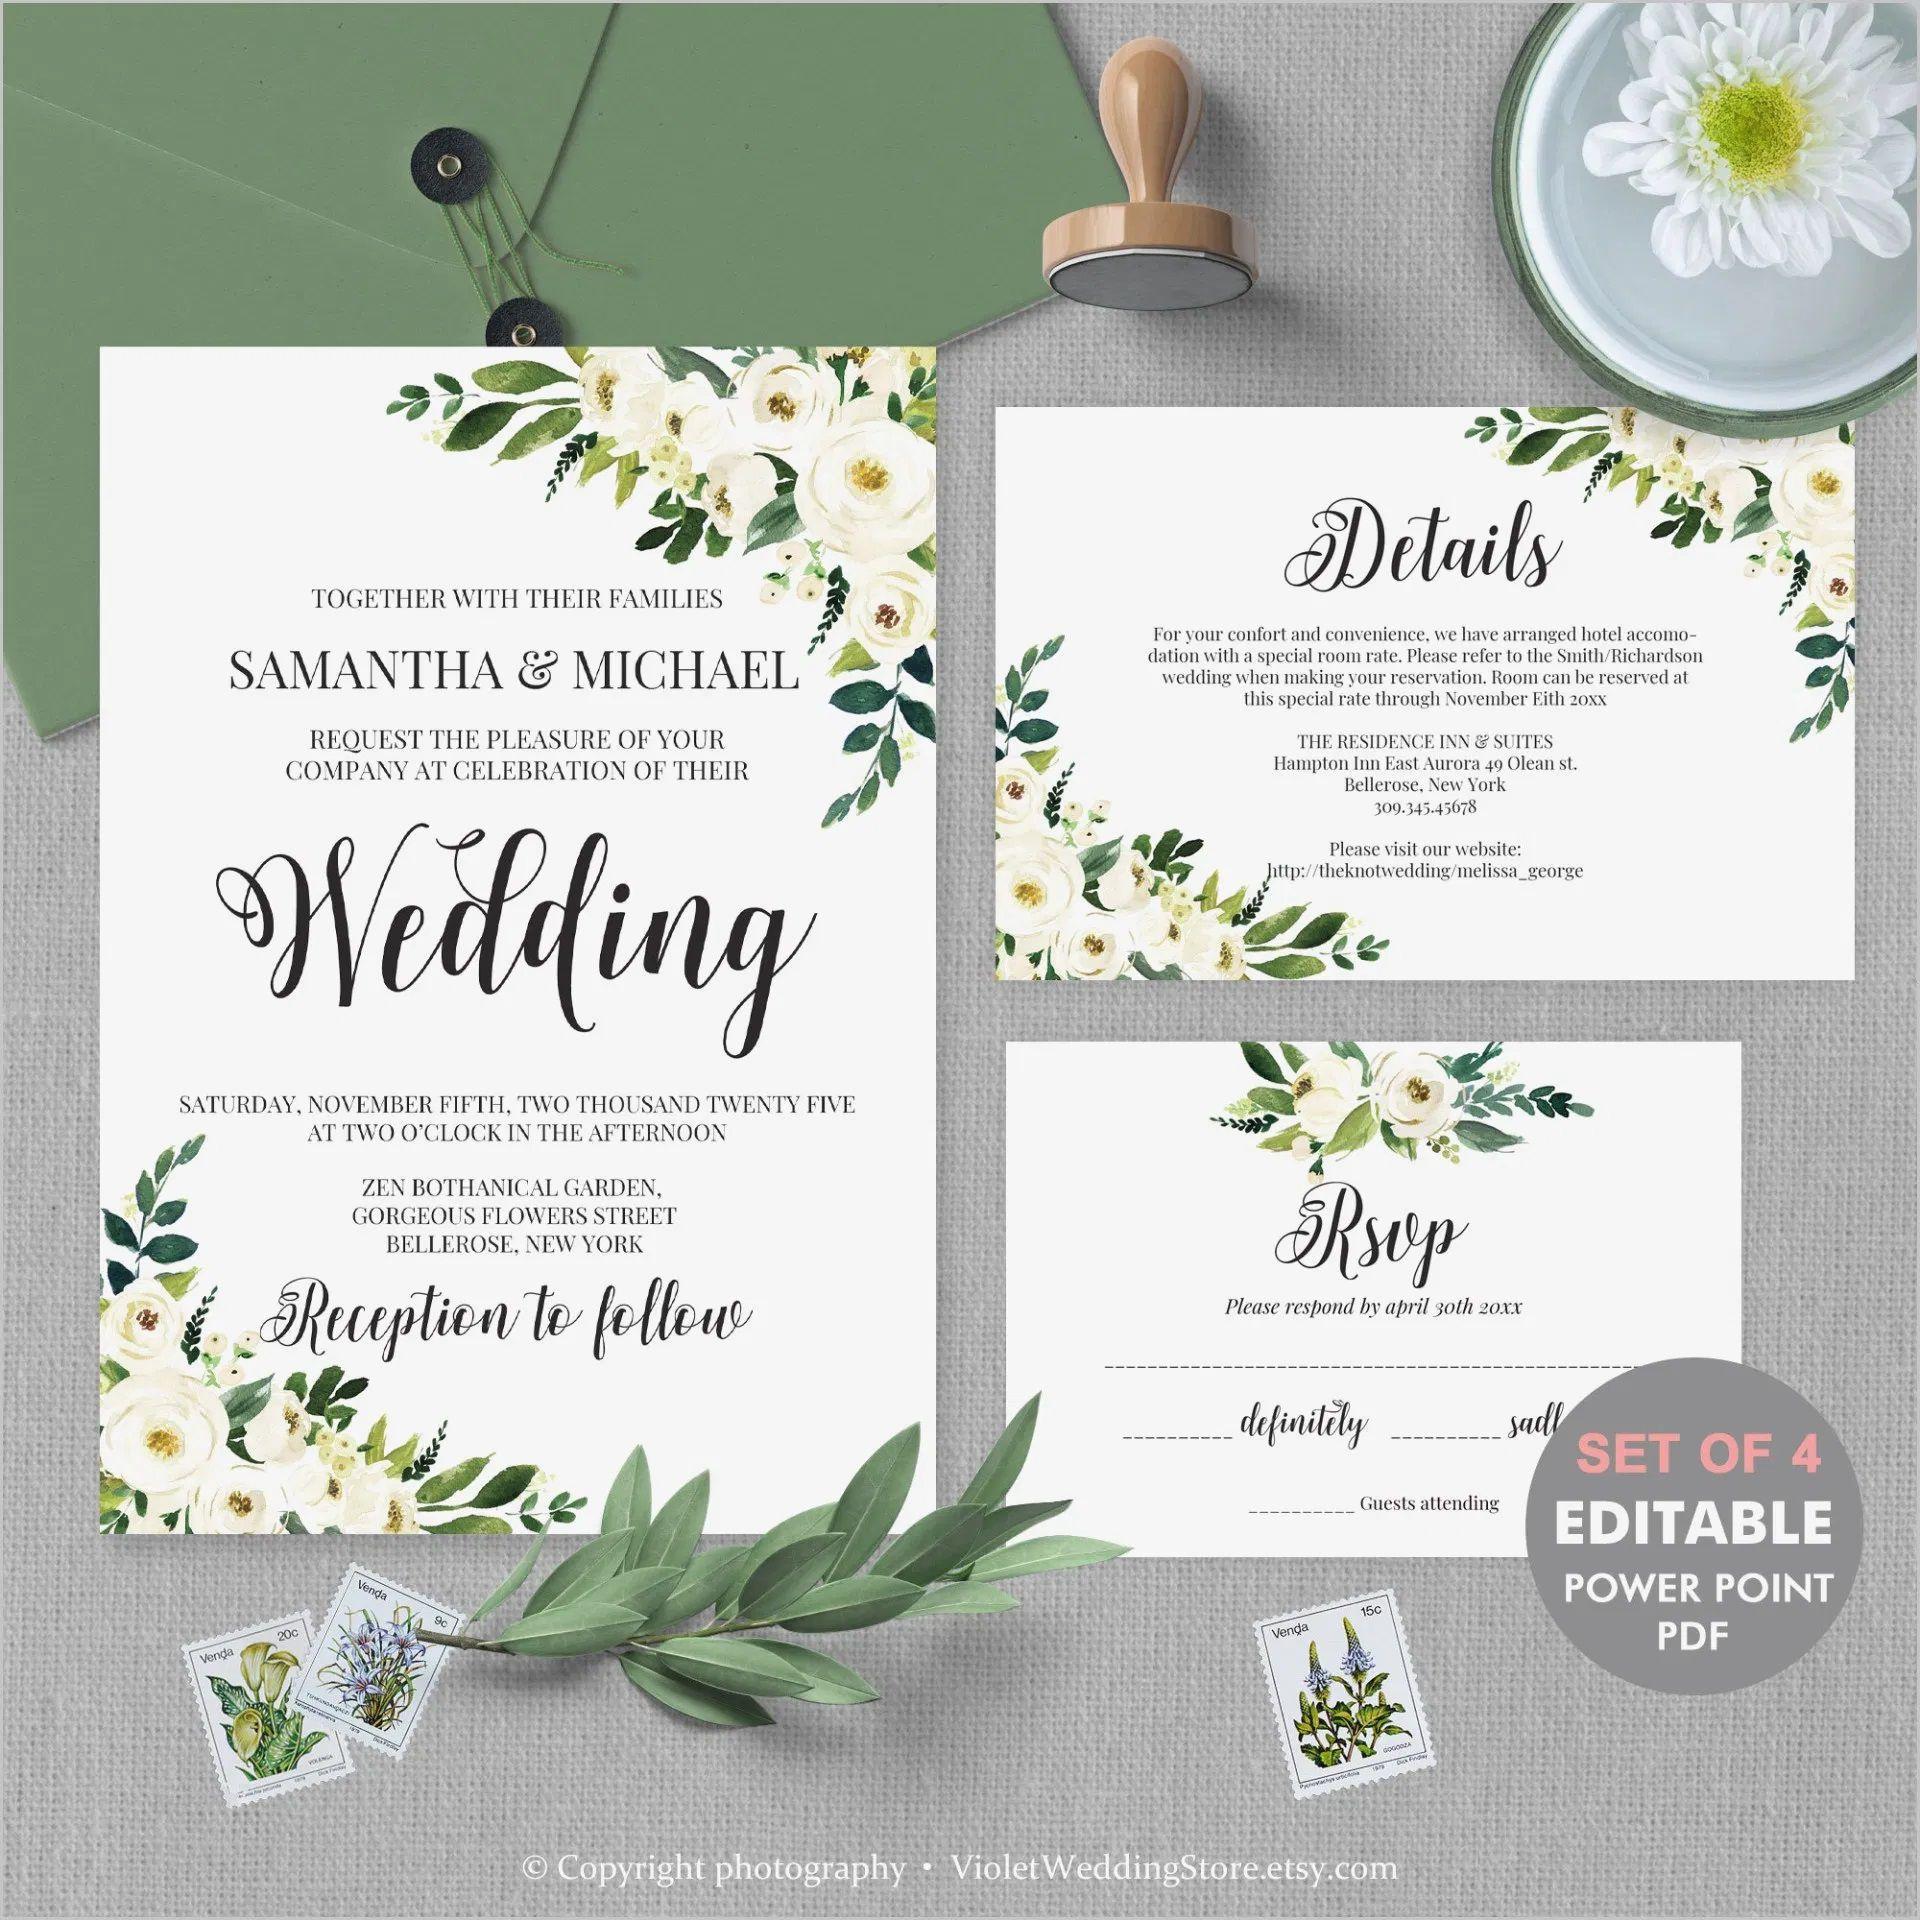 000 Fantastic Editable Wedding Invitation Template Inspiration  Templates Tamil Card Free Download Psd OnlineFull